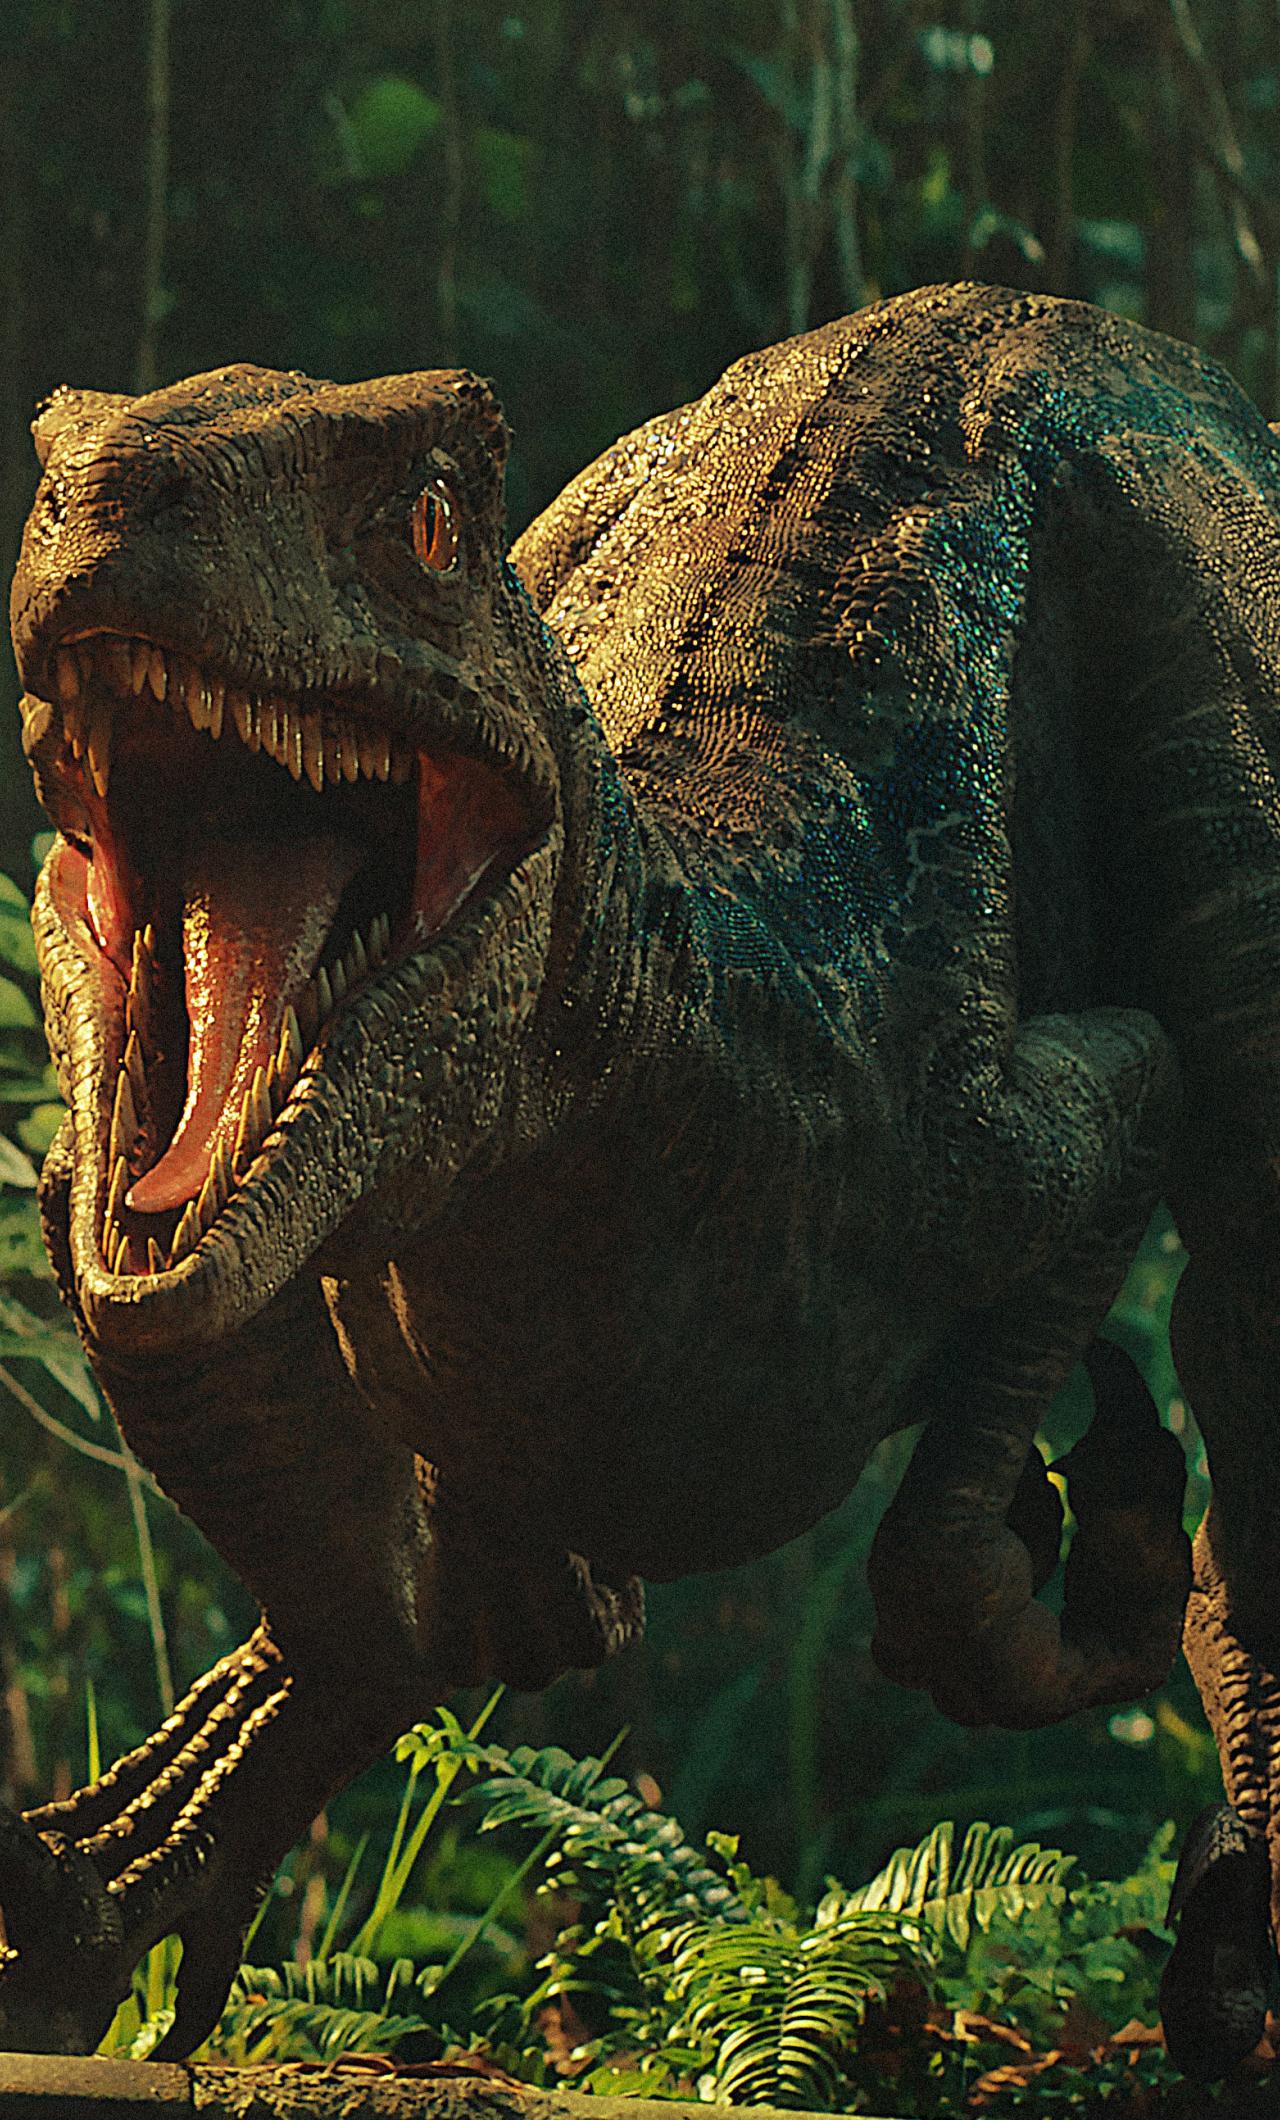 Jurassic World Fallen Kingdom Dinosaurs, HD 4K Wallpaper